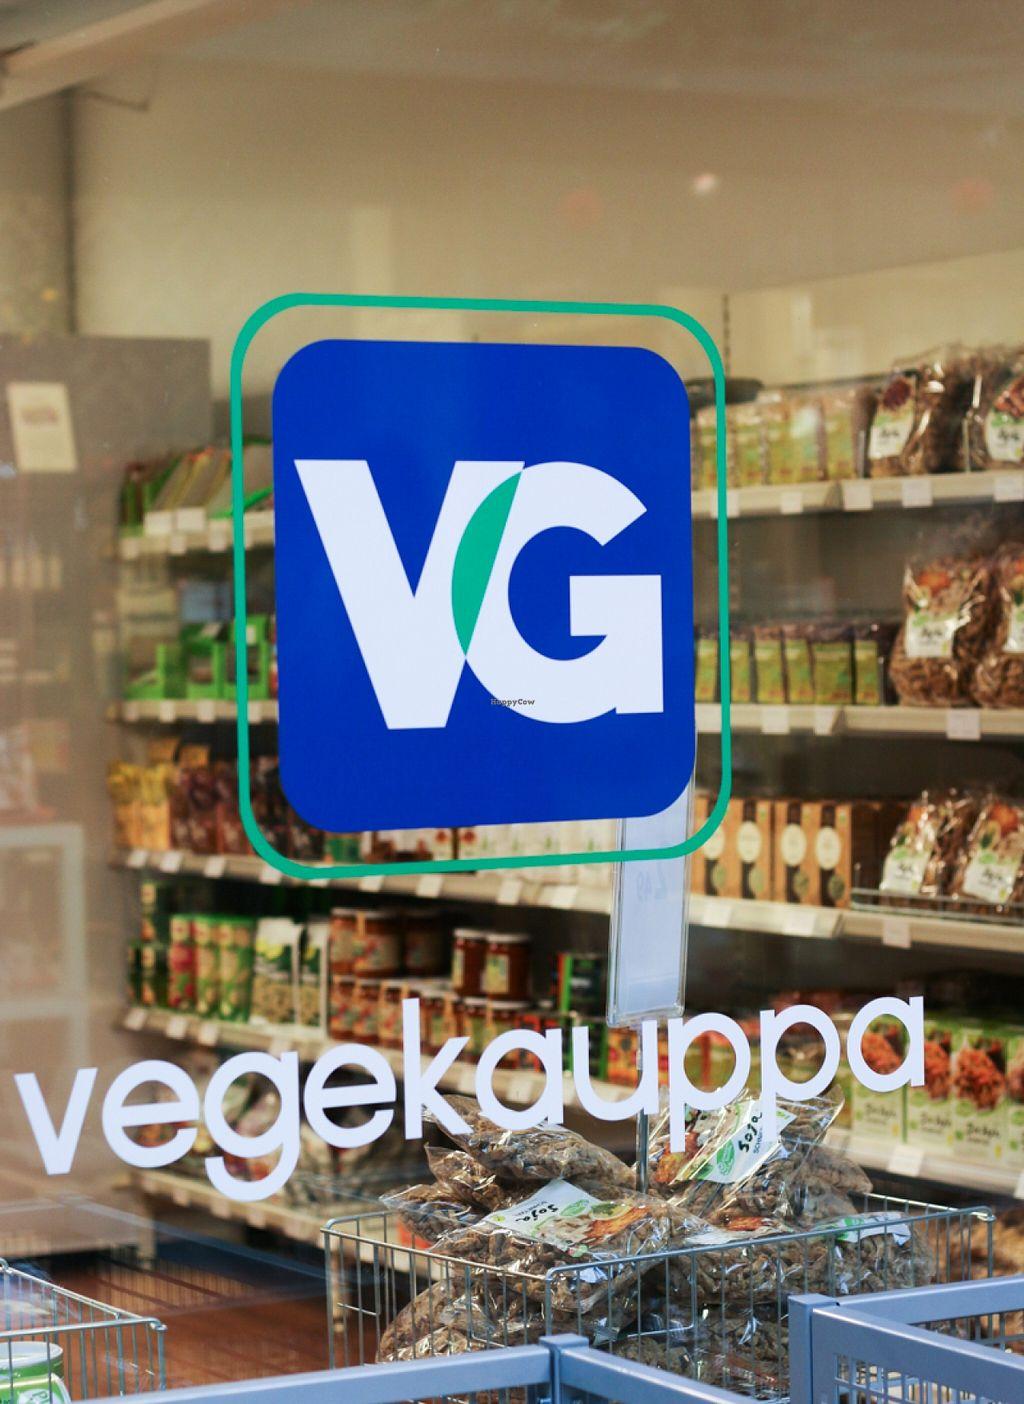 Photo of Vegekauppa  by VegekauppaTurku <br/>Vegekauppa at Forum Kortteli shopping centre.  <br/> January 24, 2016  - <a href='/contact/abuse/image/27954/133487'>Report</a>